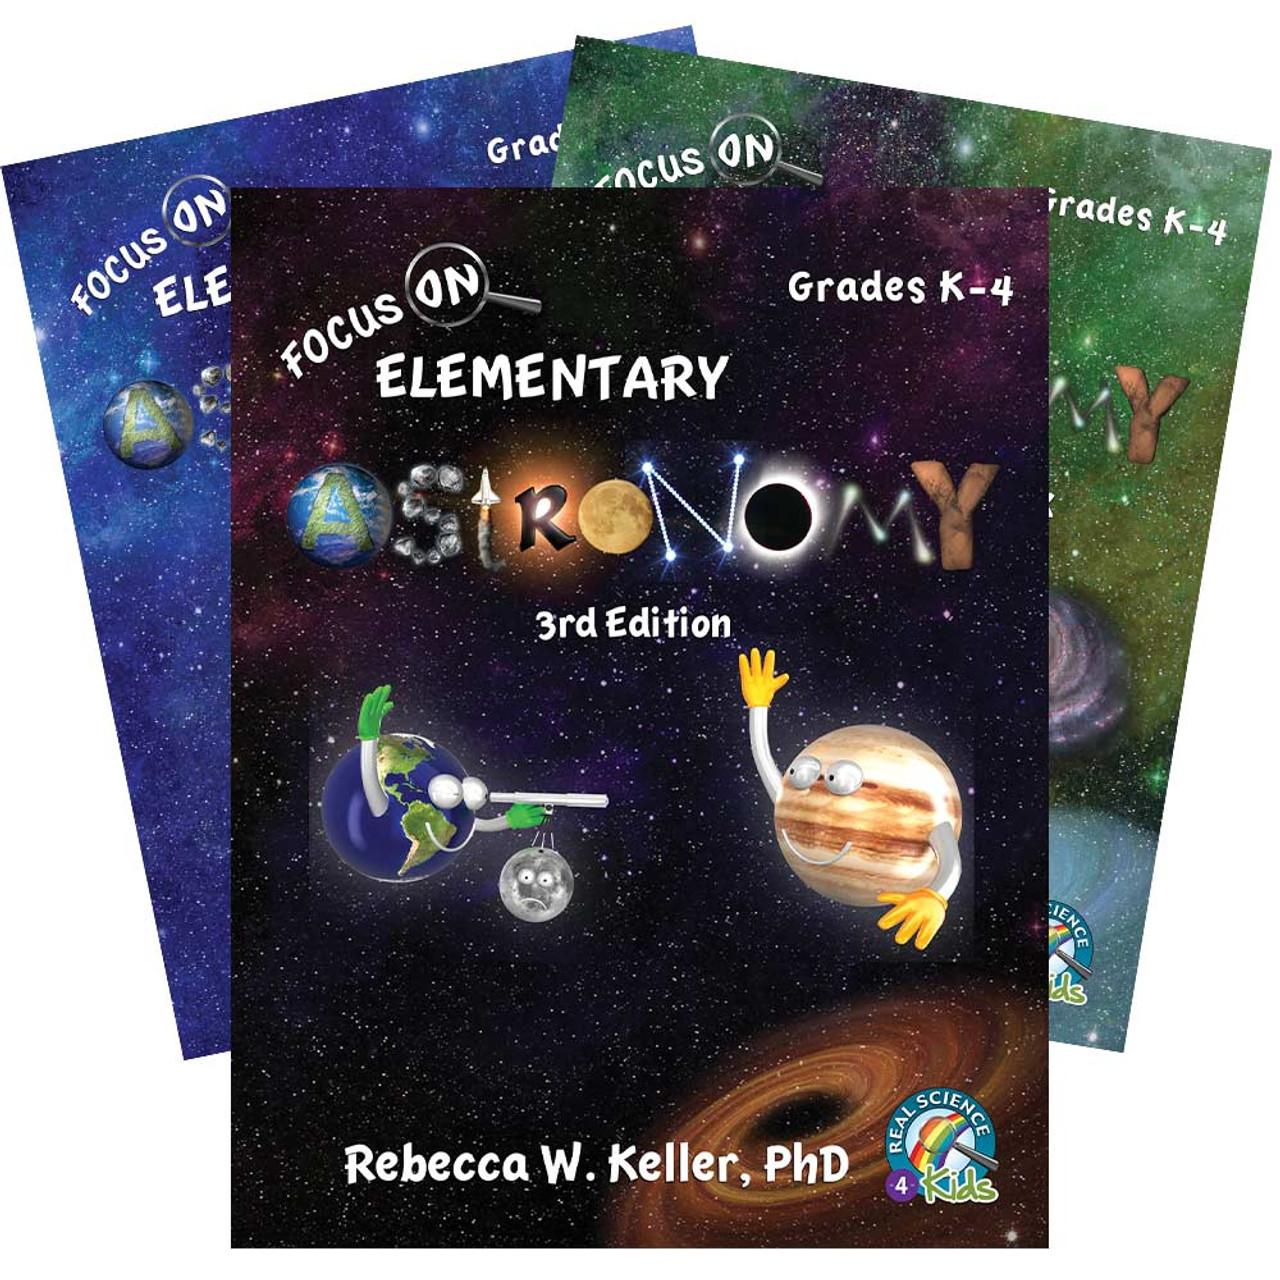 RS4K   Focus On Elementary Astronomy Set [ 1280 x 1280 Pixel ]